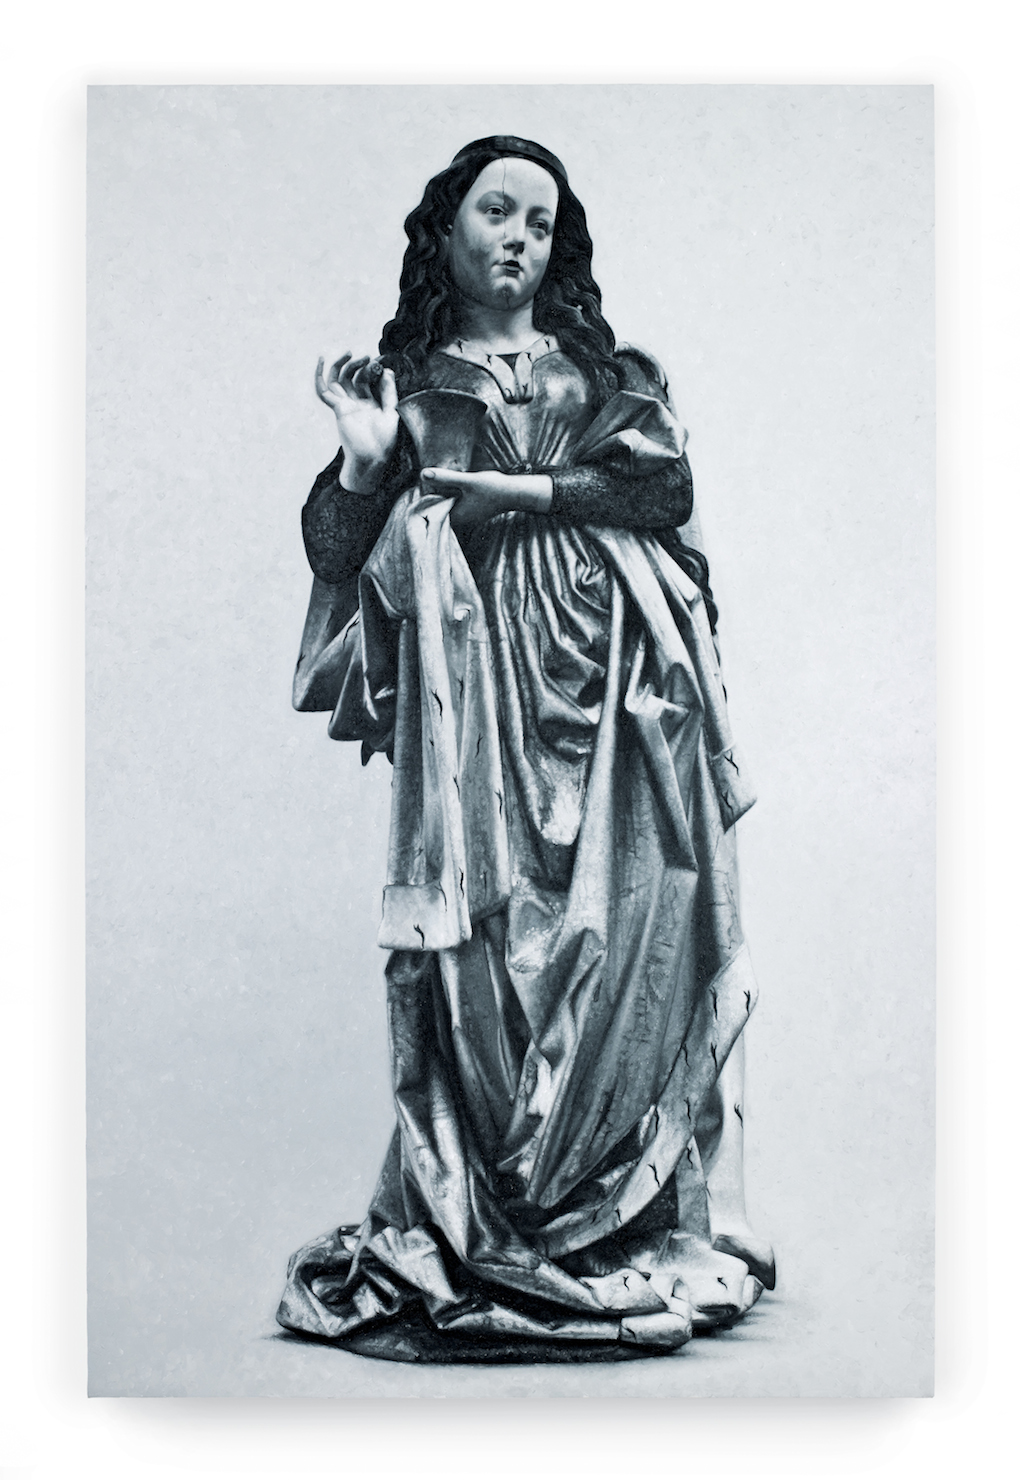 Rudolf Stingel, Untitled (St. Barbara), 2009